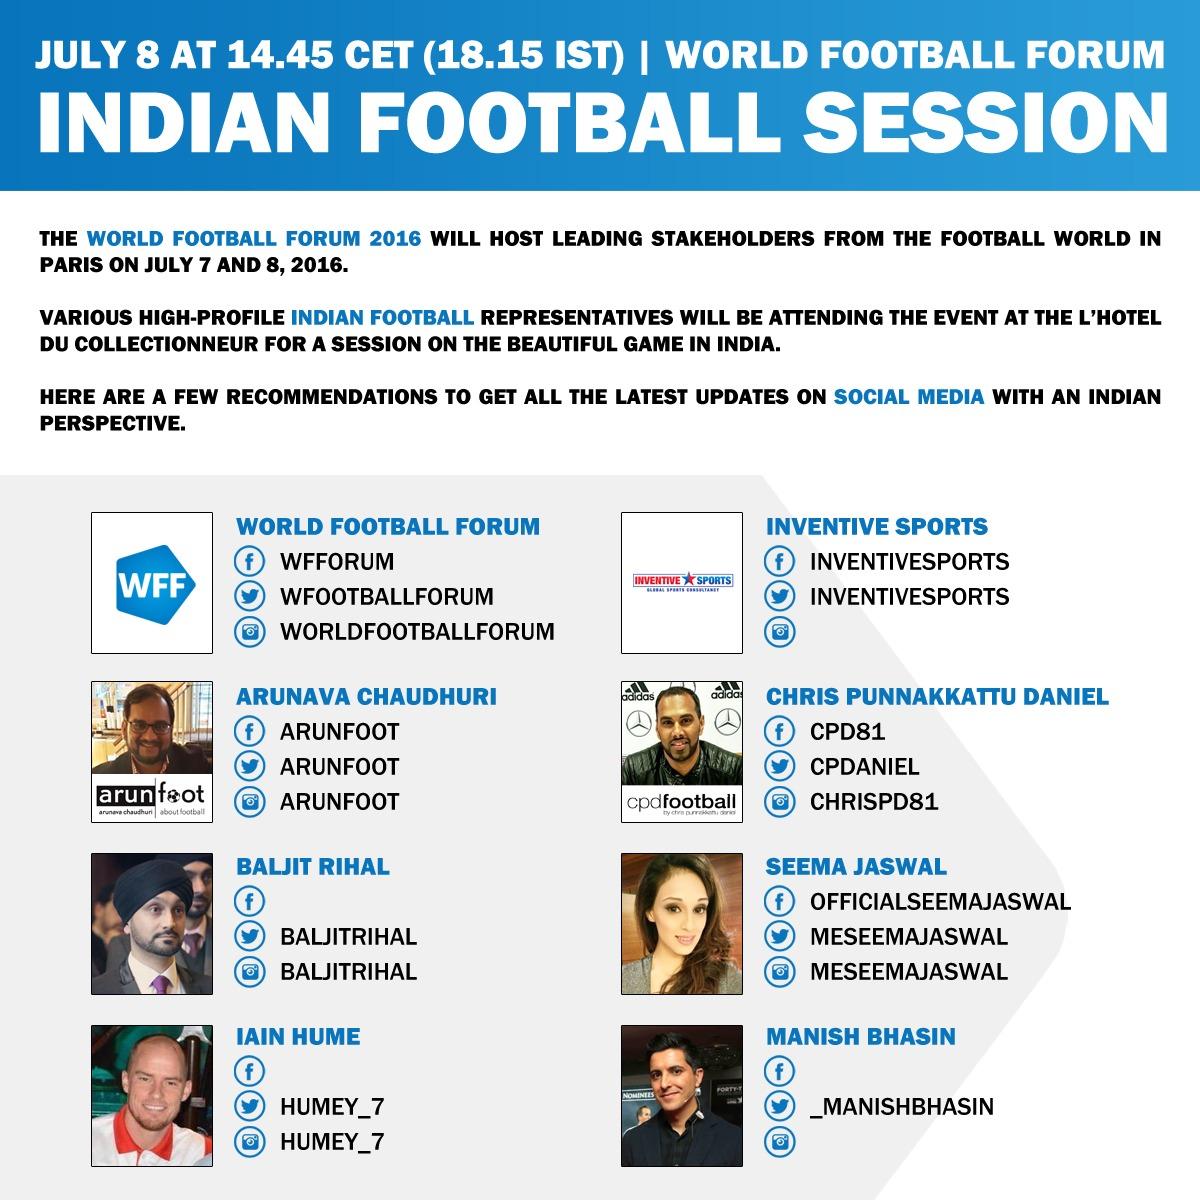 World Football Forum - Indian Football Session - Social Media